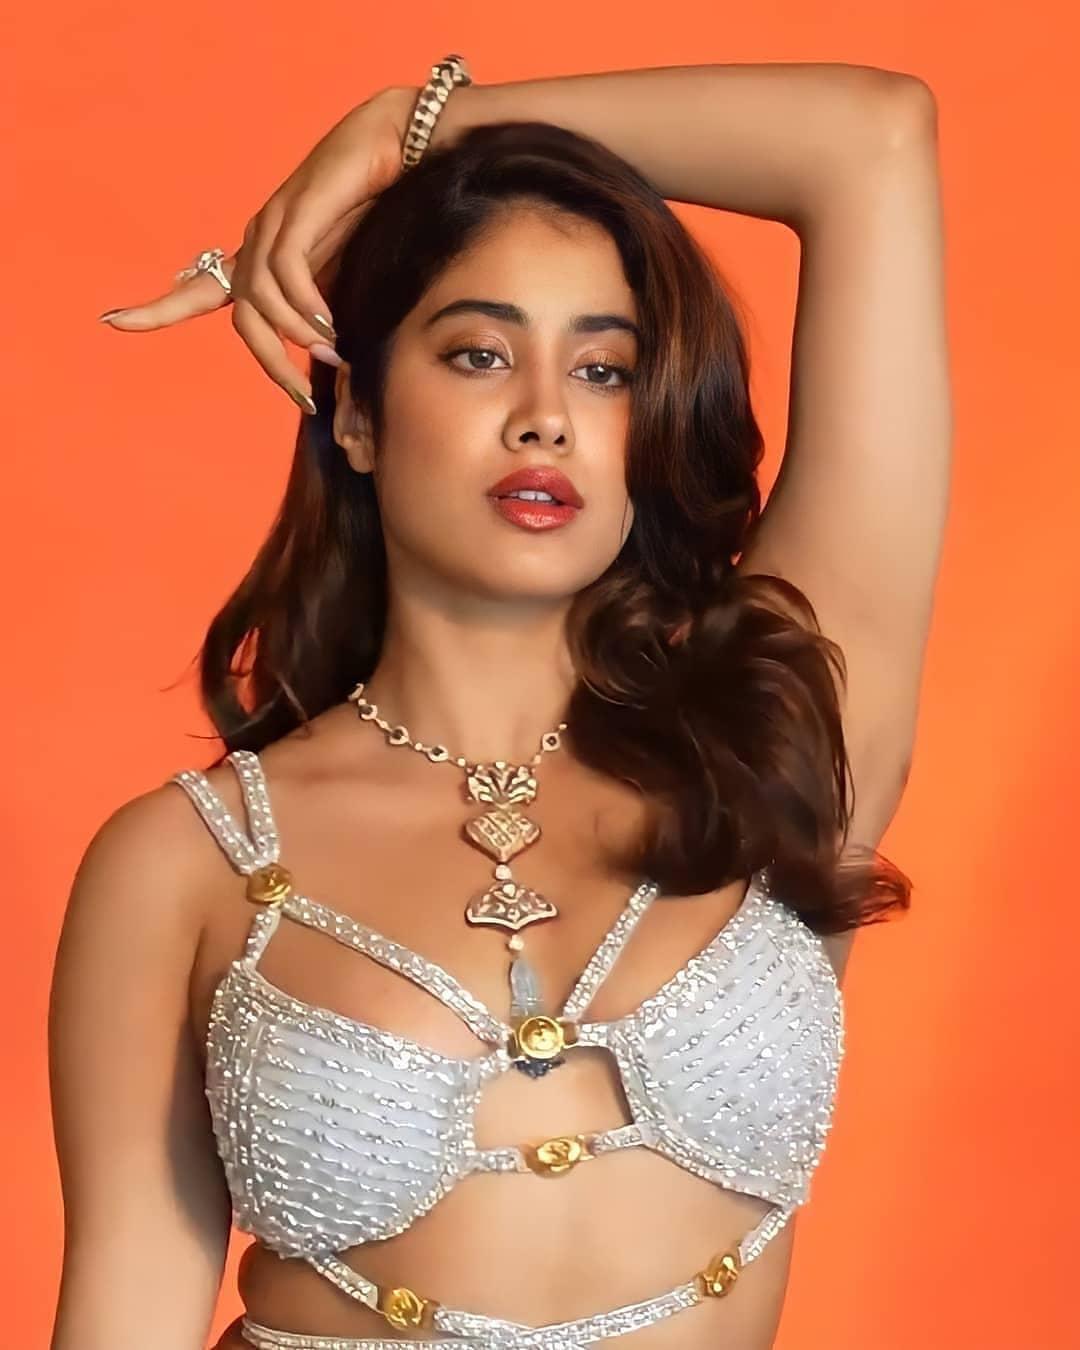 Actress Janhvi Kapoor Latest Hot Photoshoot Pics actressbuzz.com